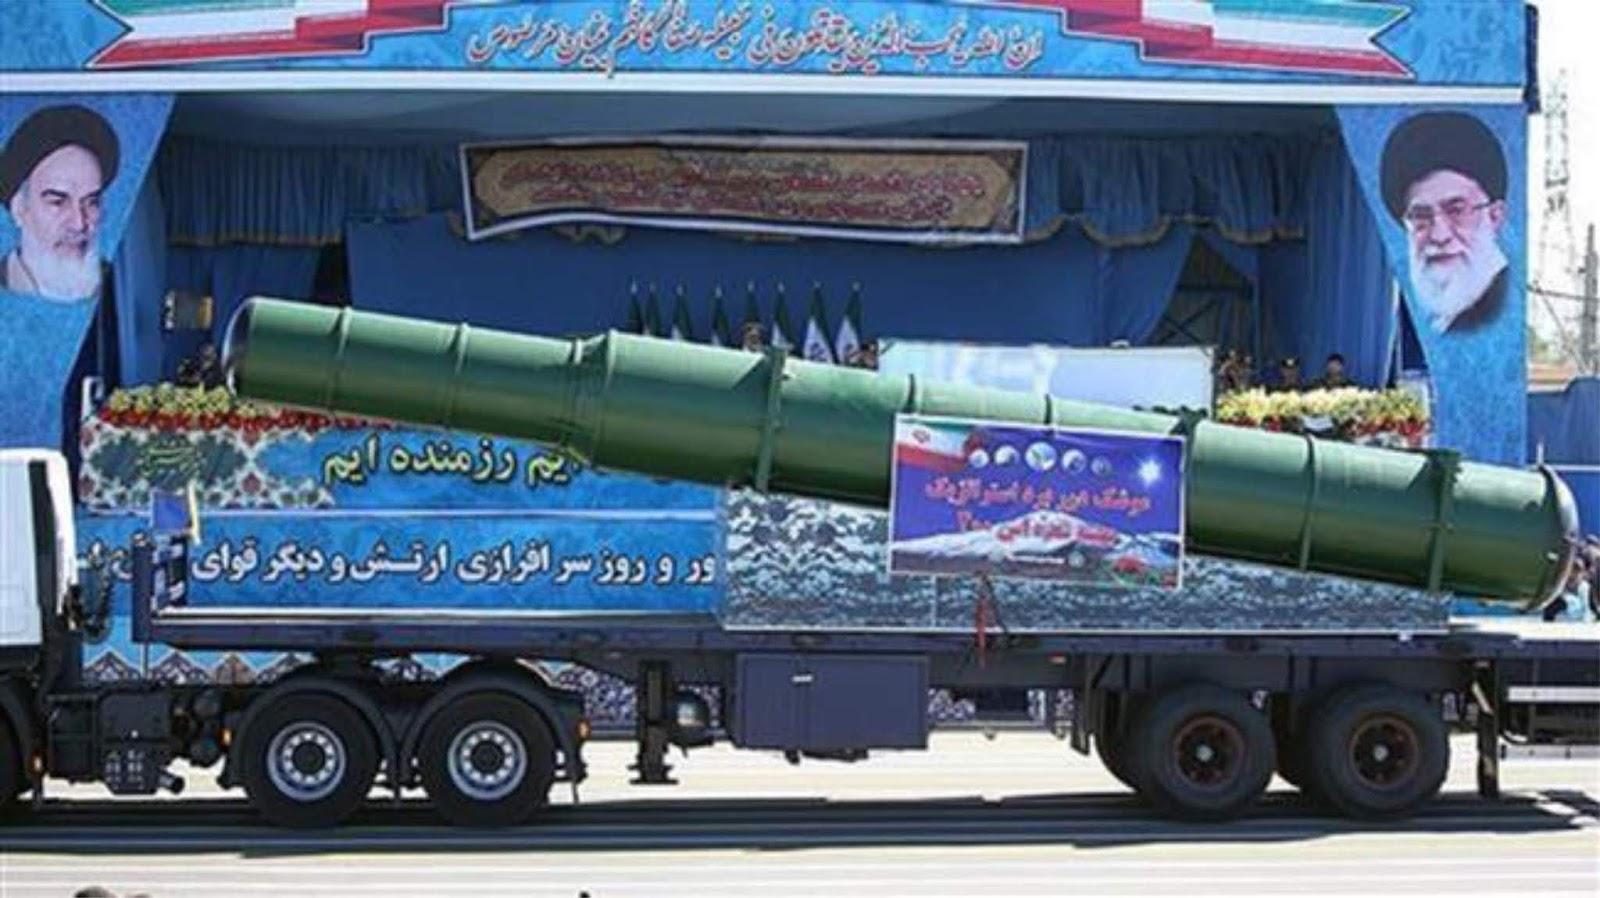 Khamenei menganggap sanksi AS membuat Iran menjadi negara yang lebih mandiri